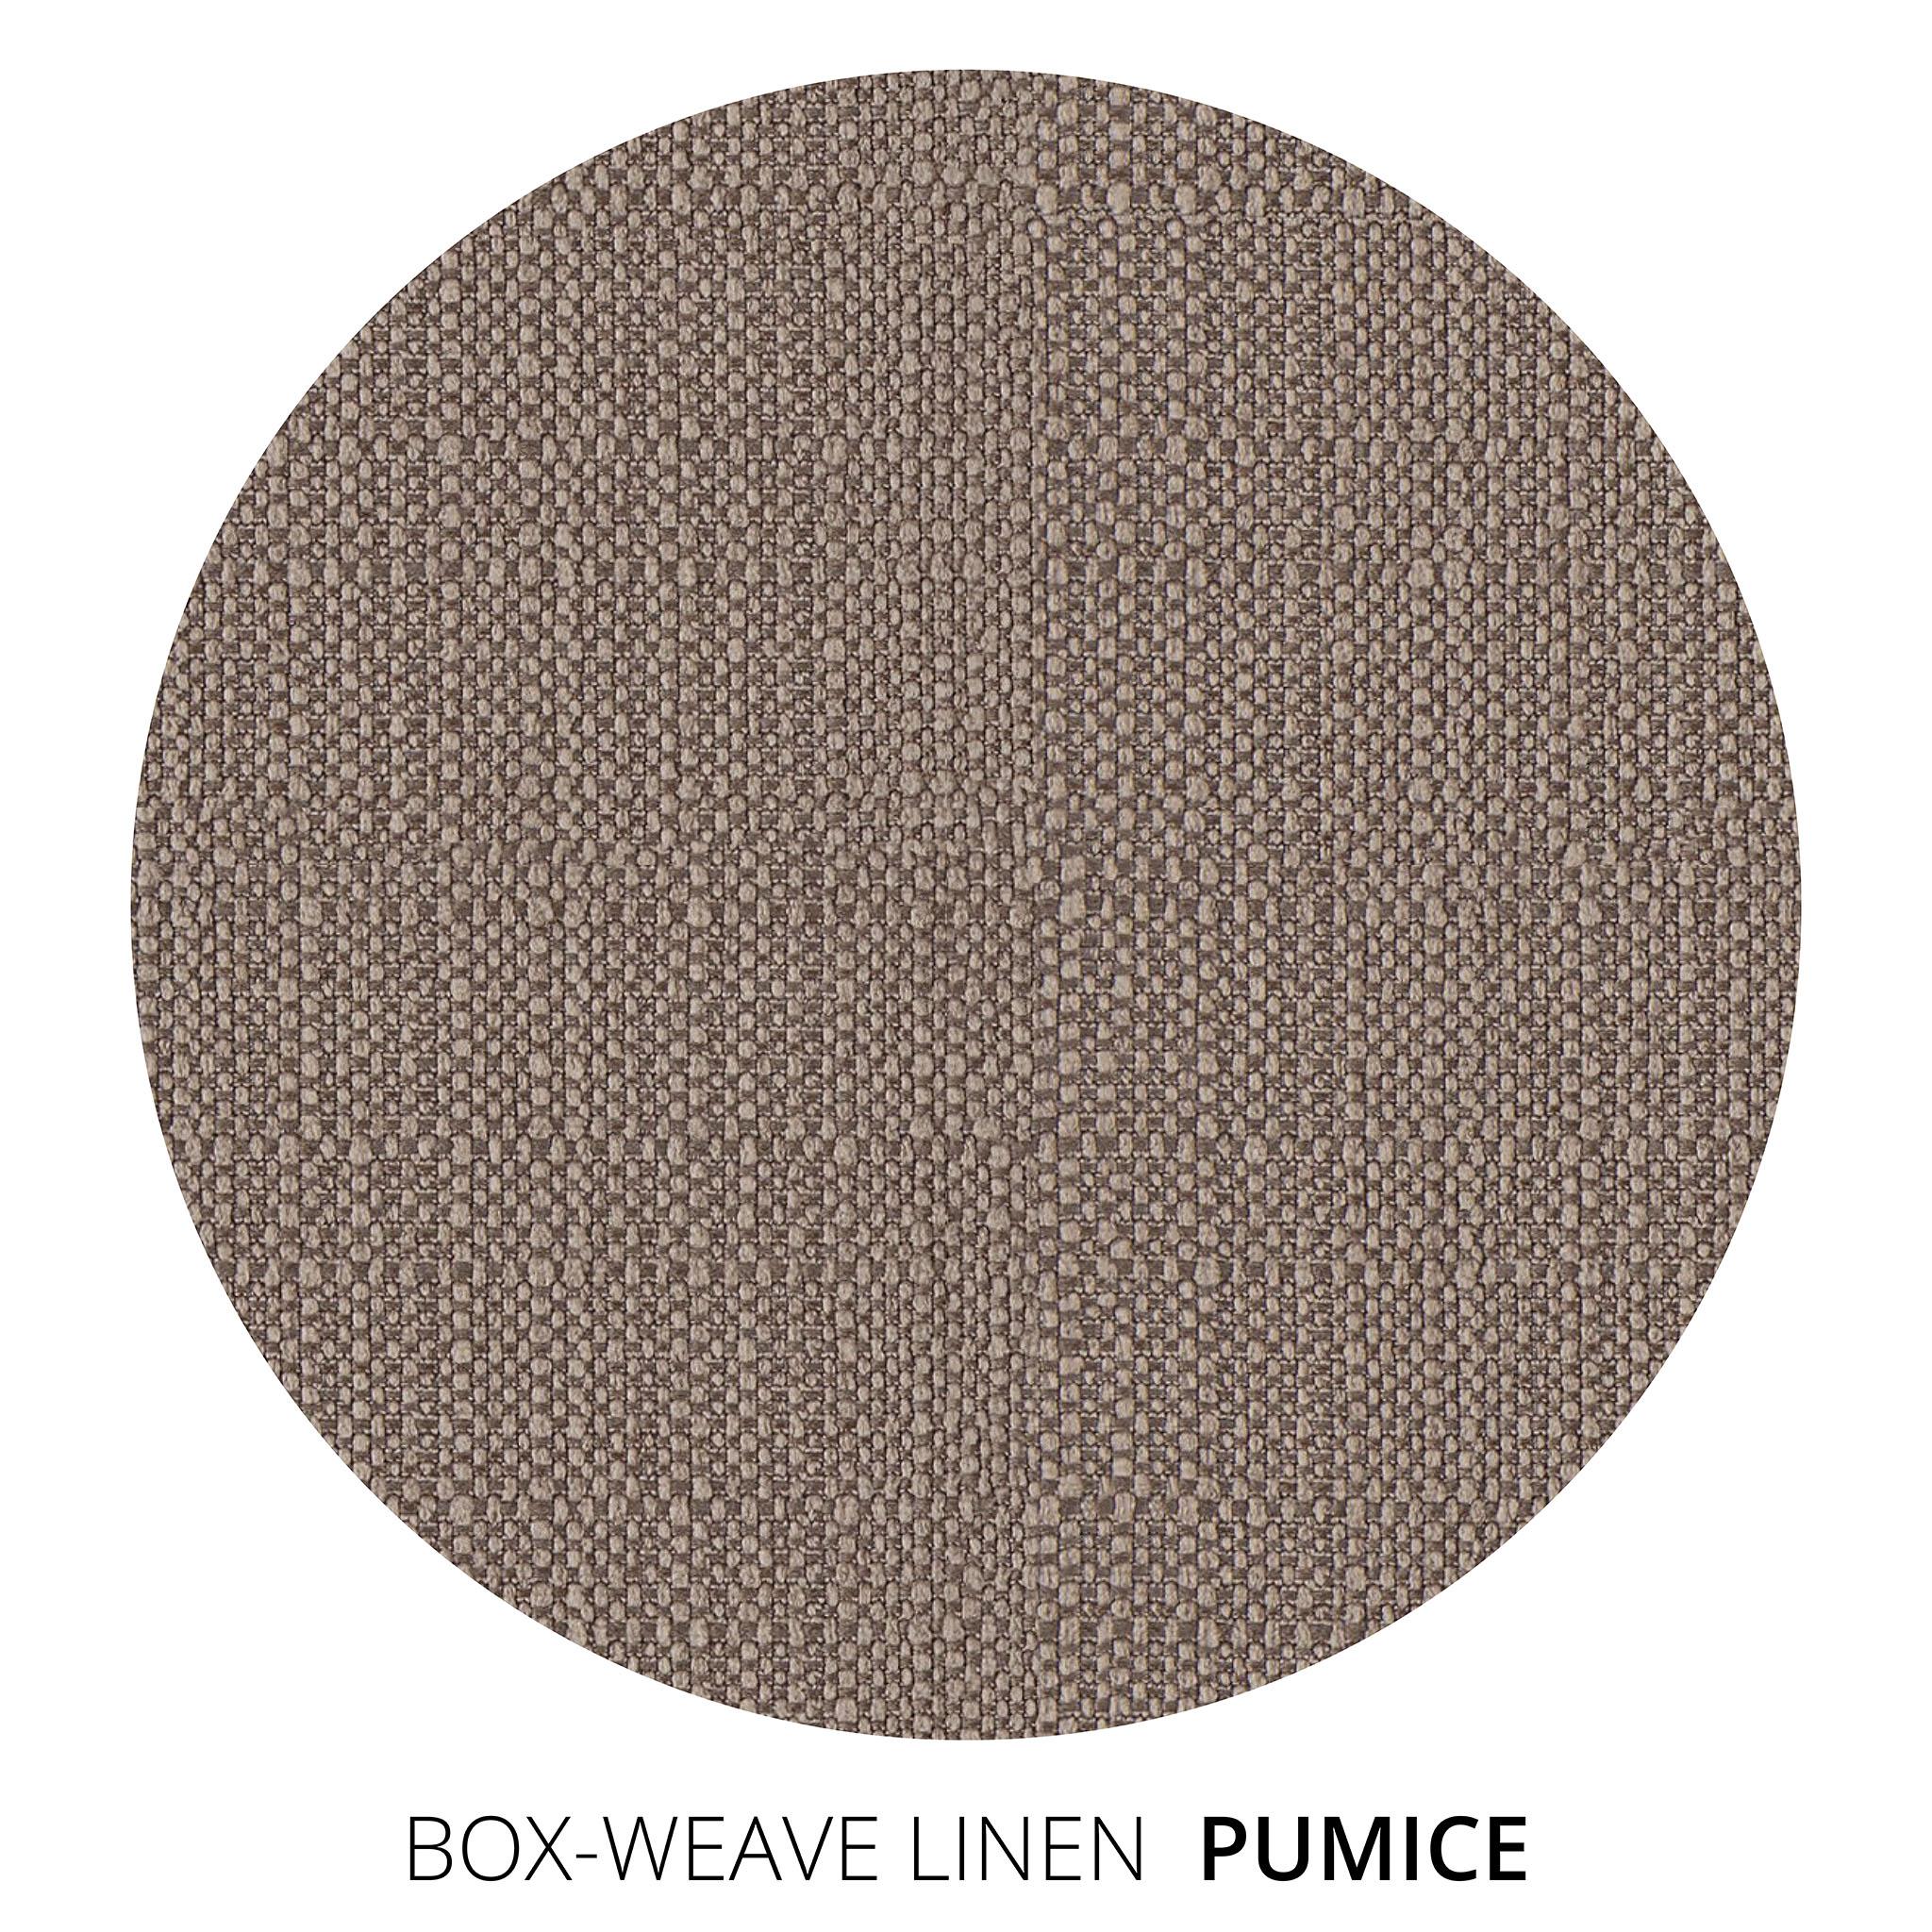 Pumice Box Weave Linen Swatch